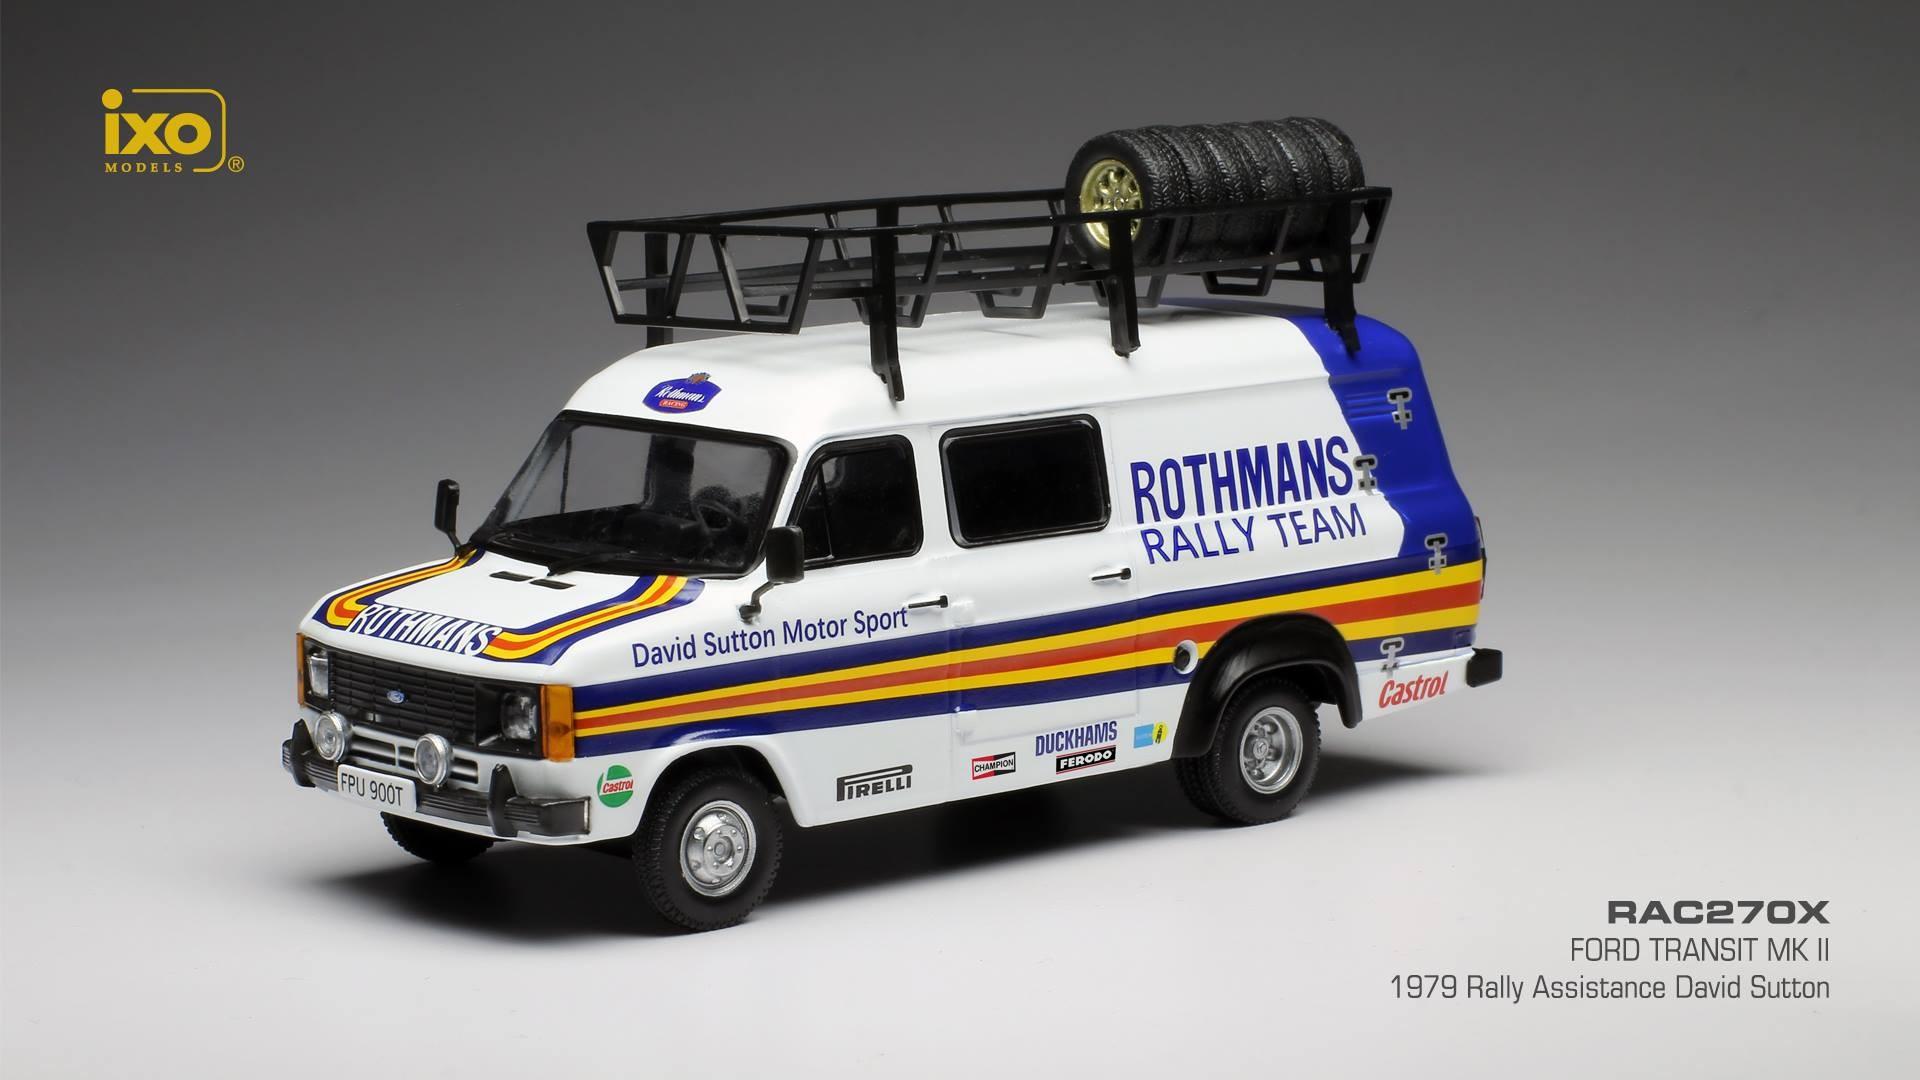 Ford Transit Mkii Rally Assistance David Sutton 1979 Ixo Rac270x